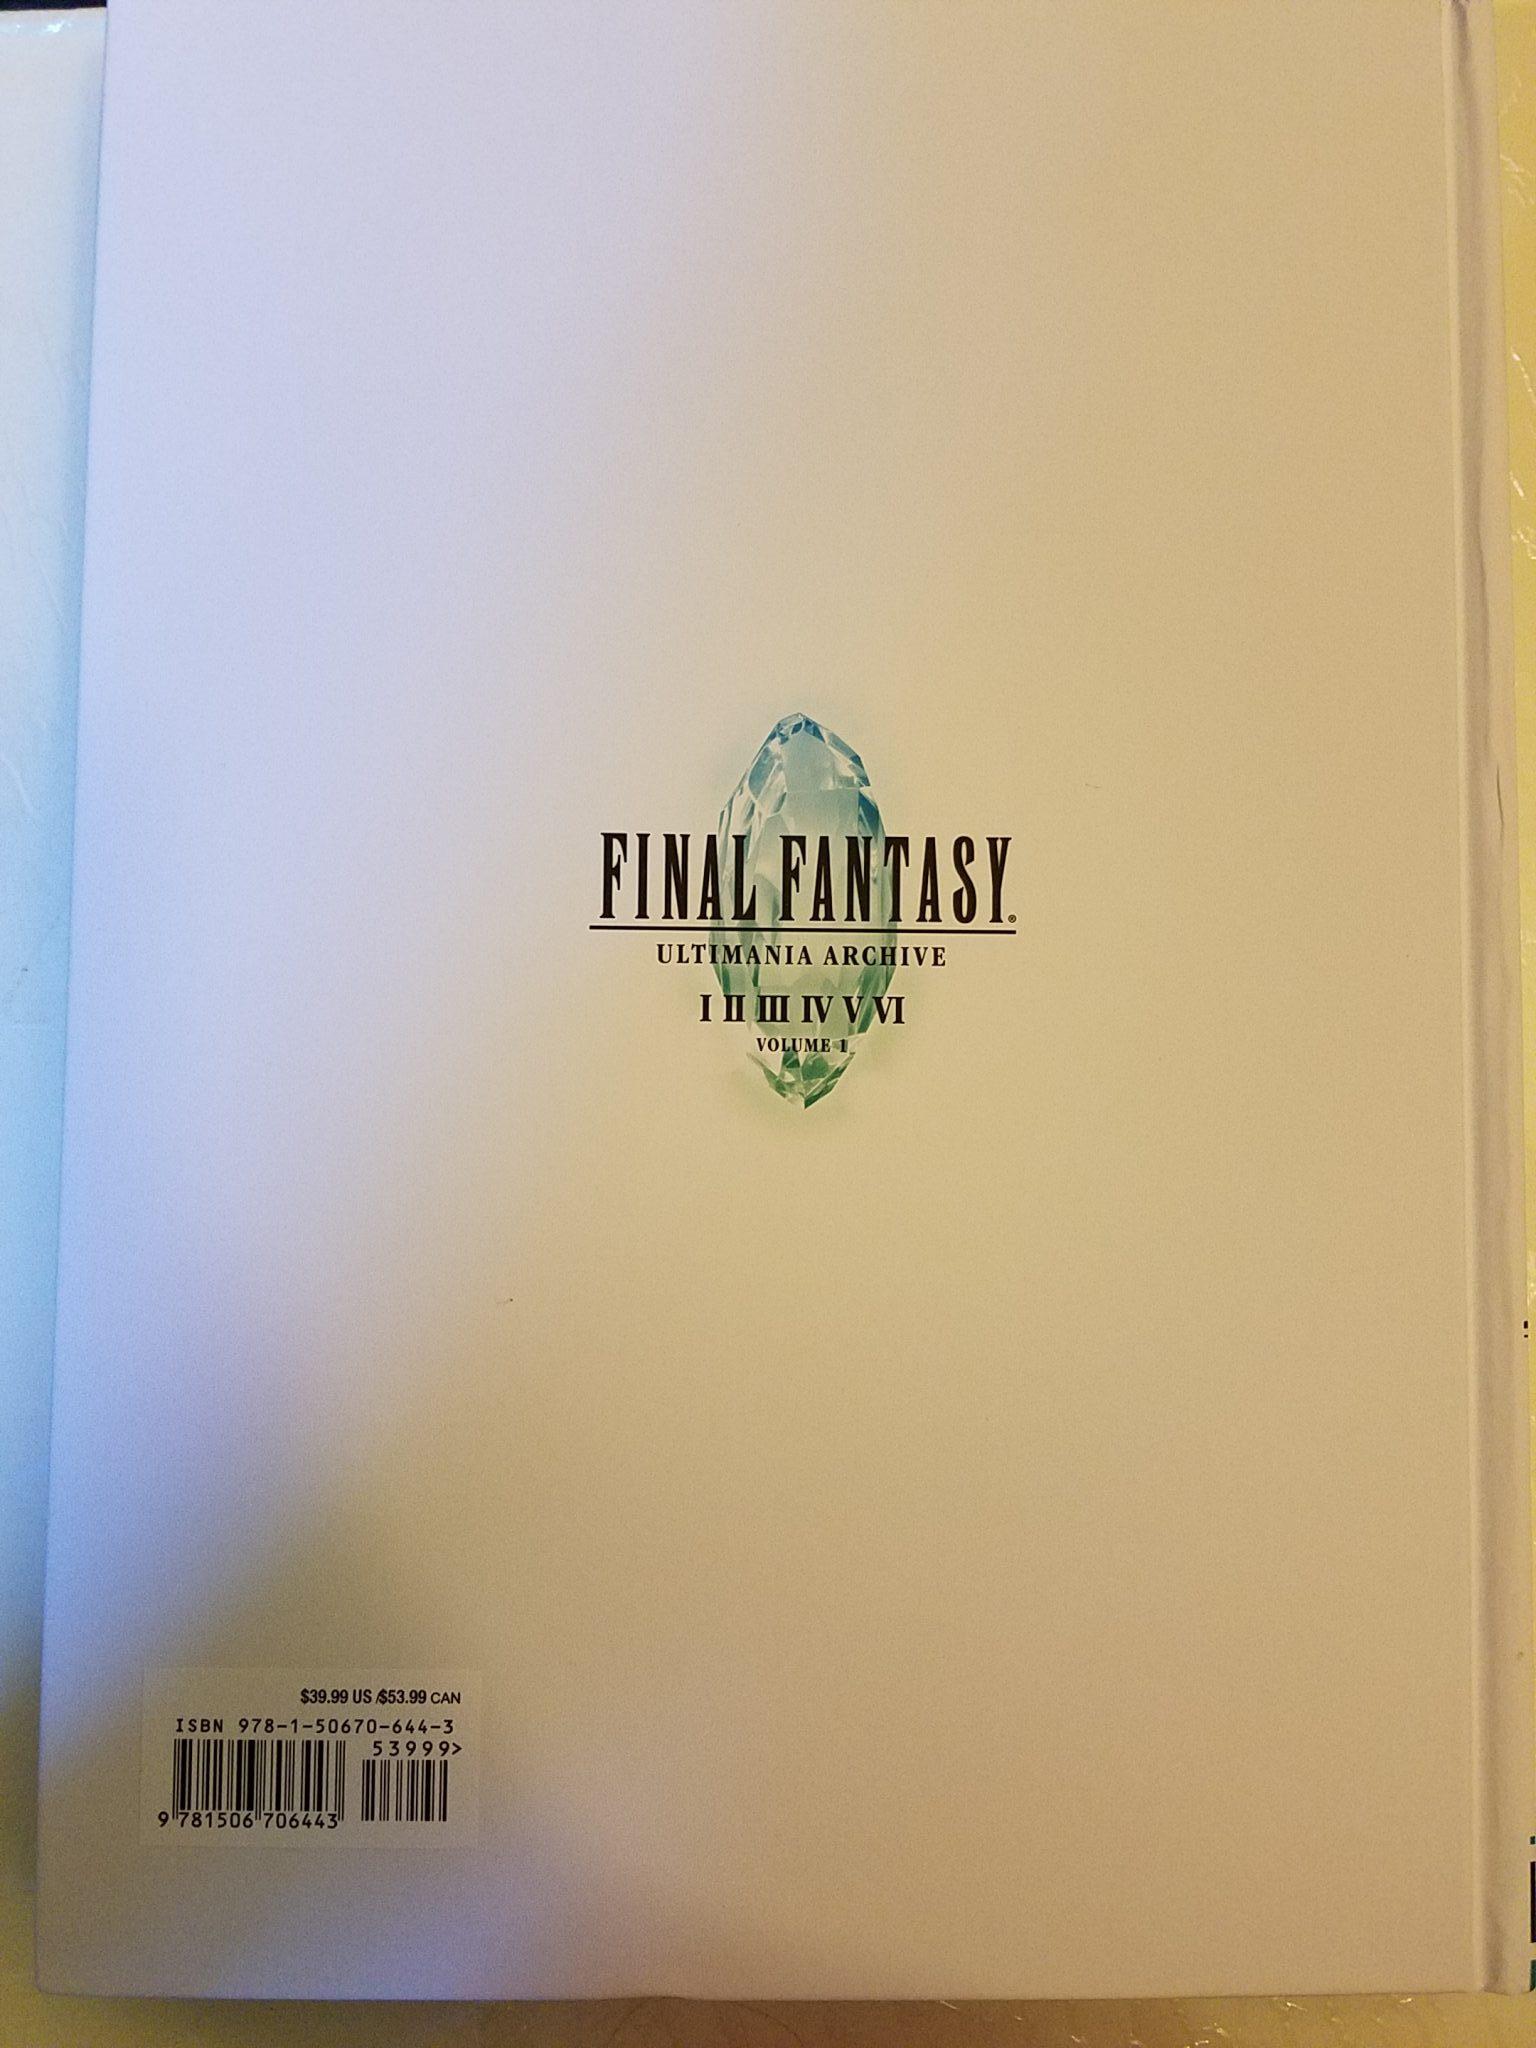 Final Fantasy Ultimania Archive 1 Back Cover